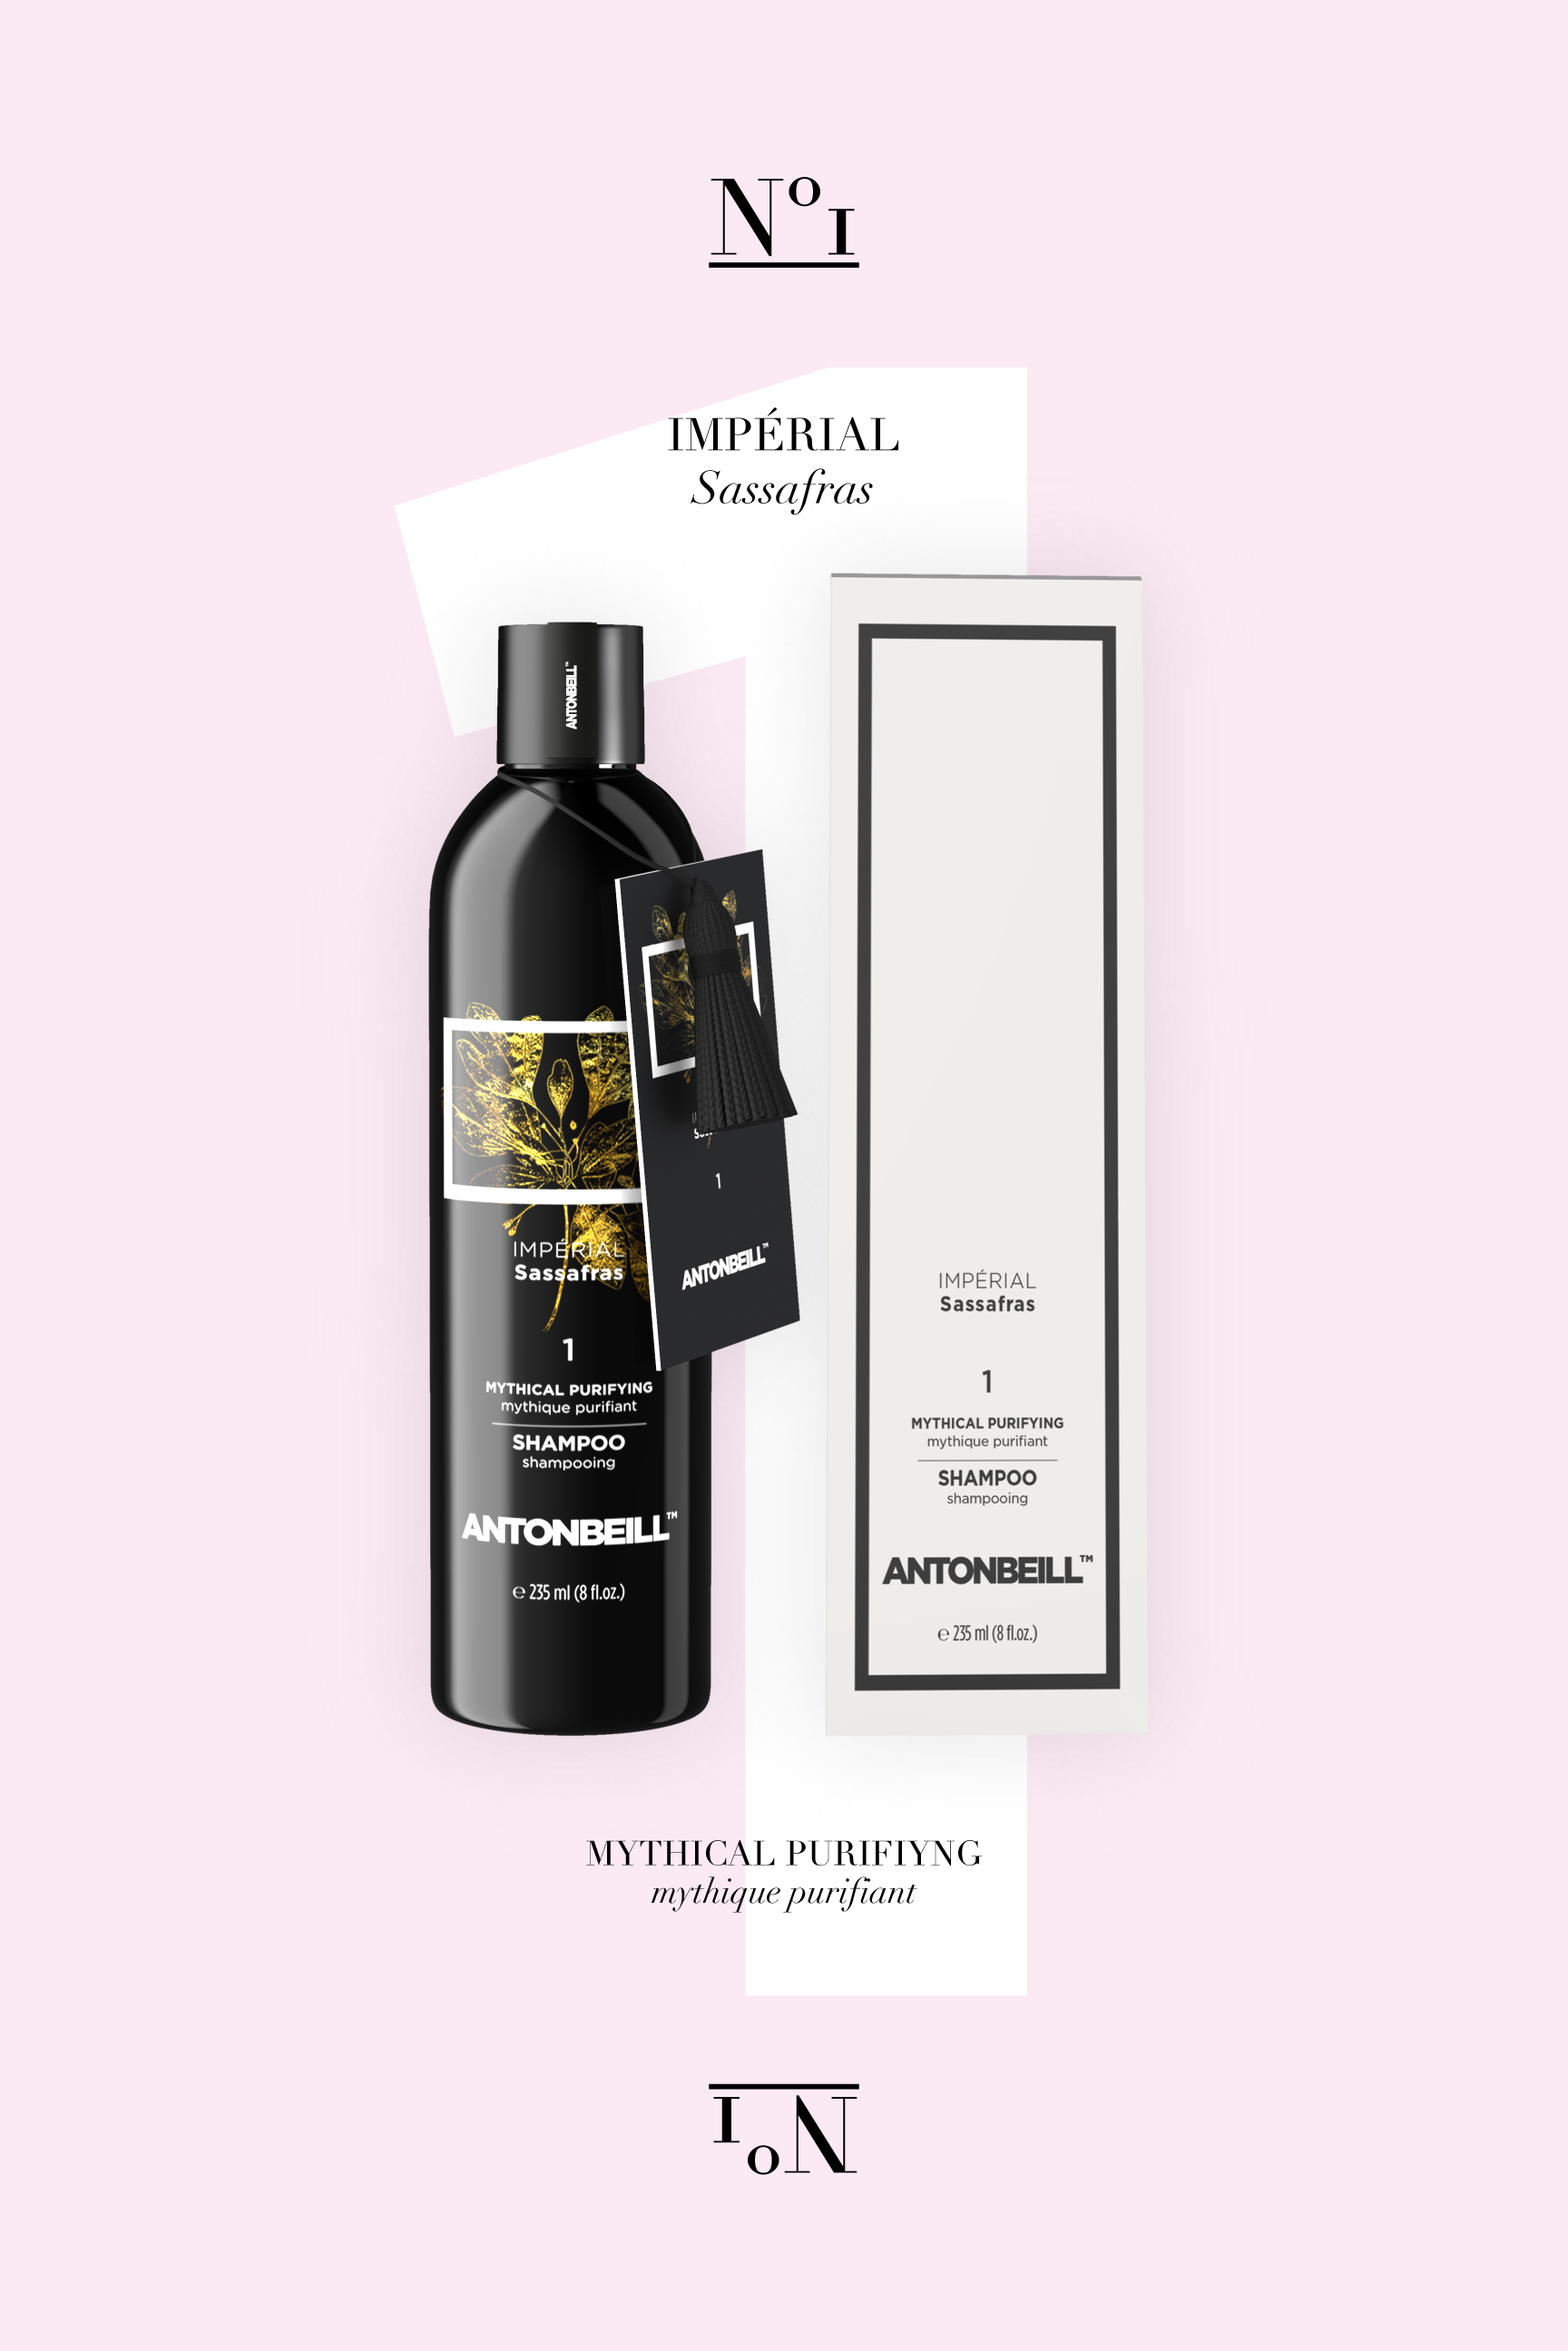 Nº1 Impérial Sassafras Shampoo - Perfect Cleansing, Nutrition & Purification